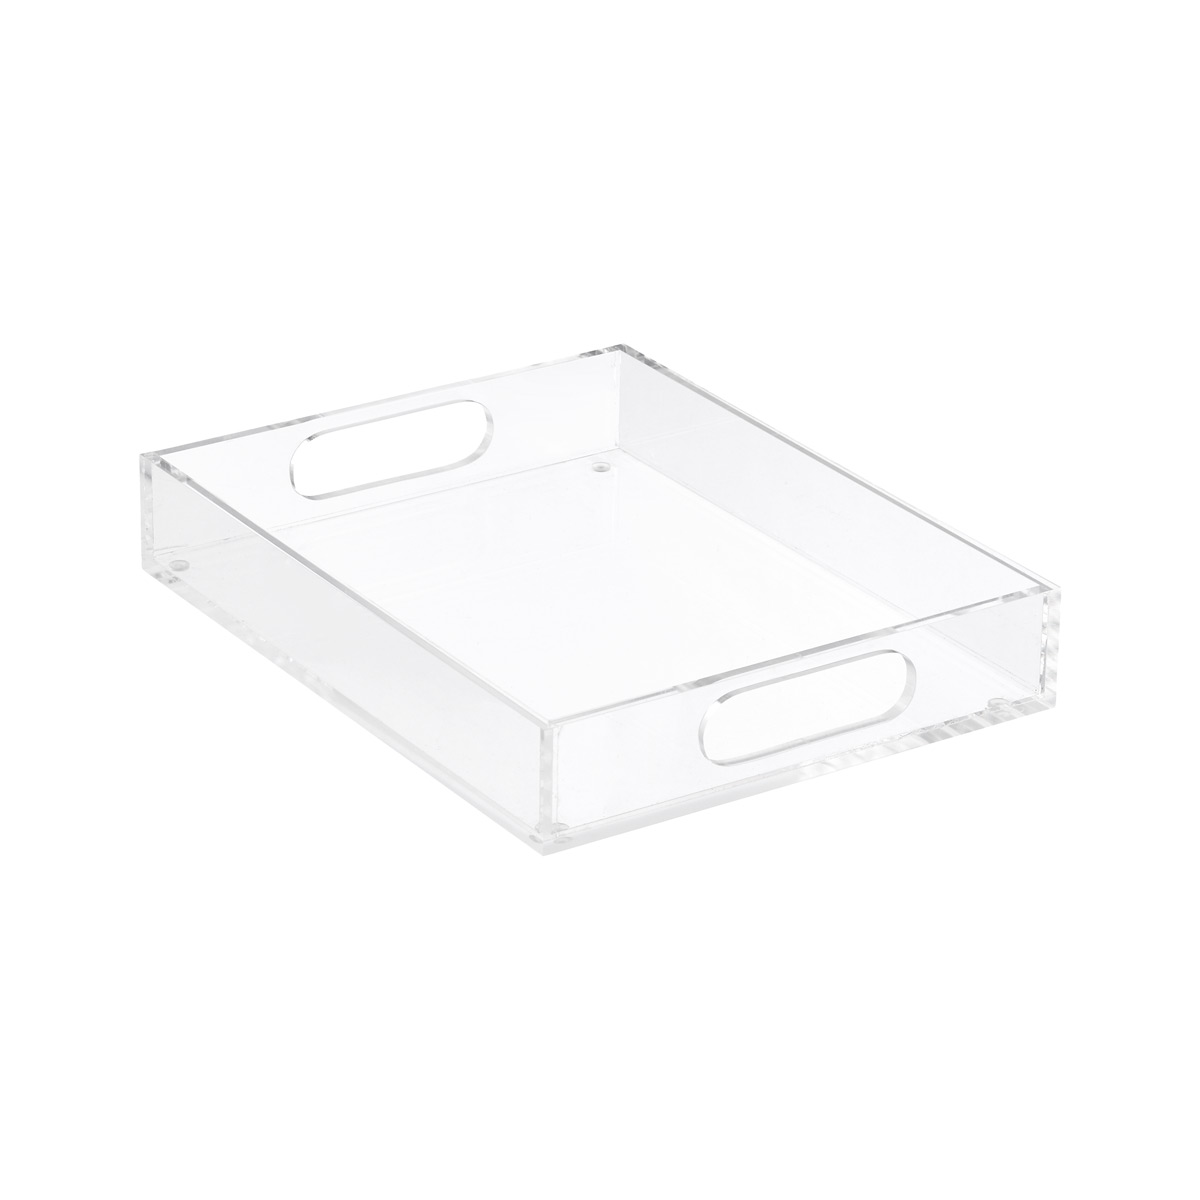 Small Premium Acrylic Paper Tray